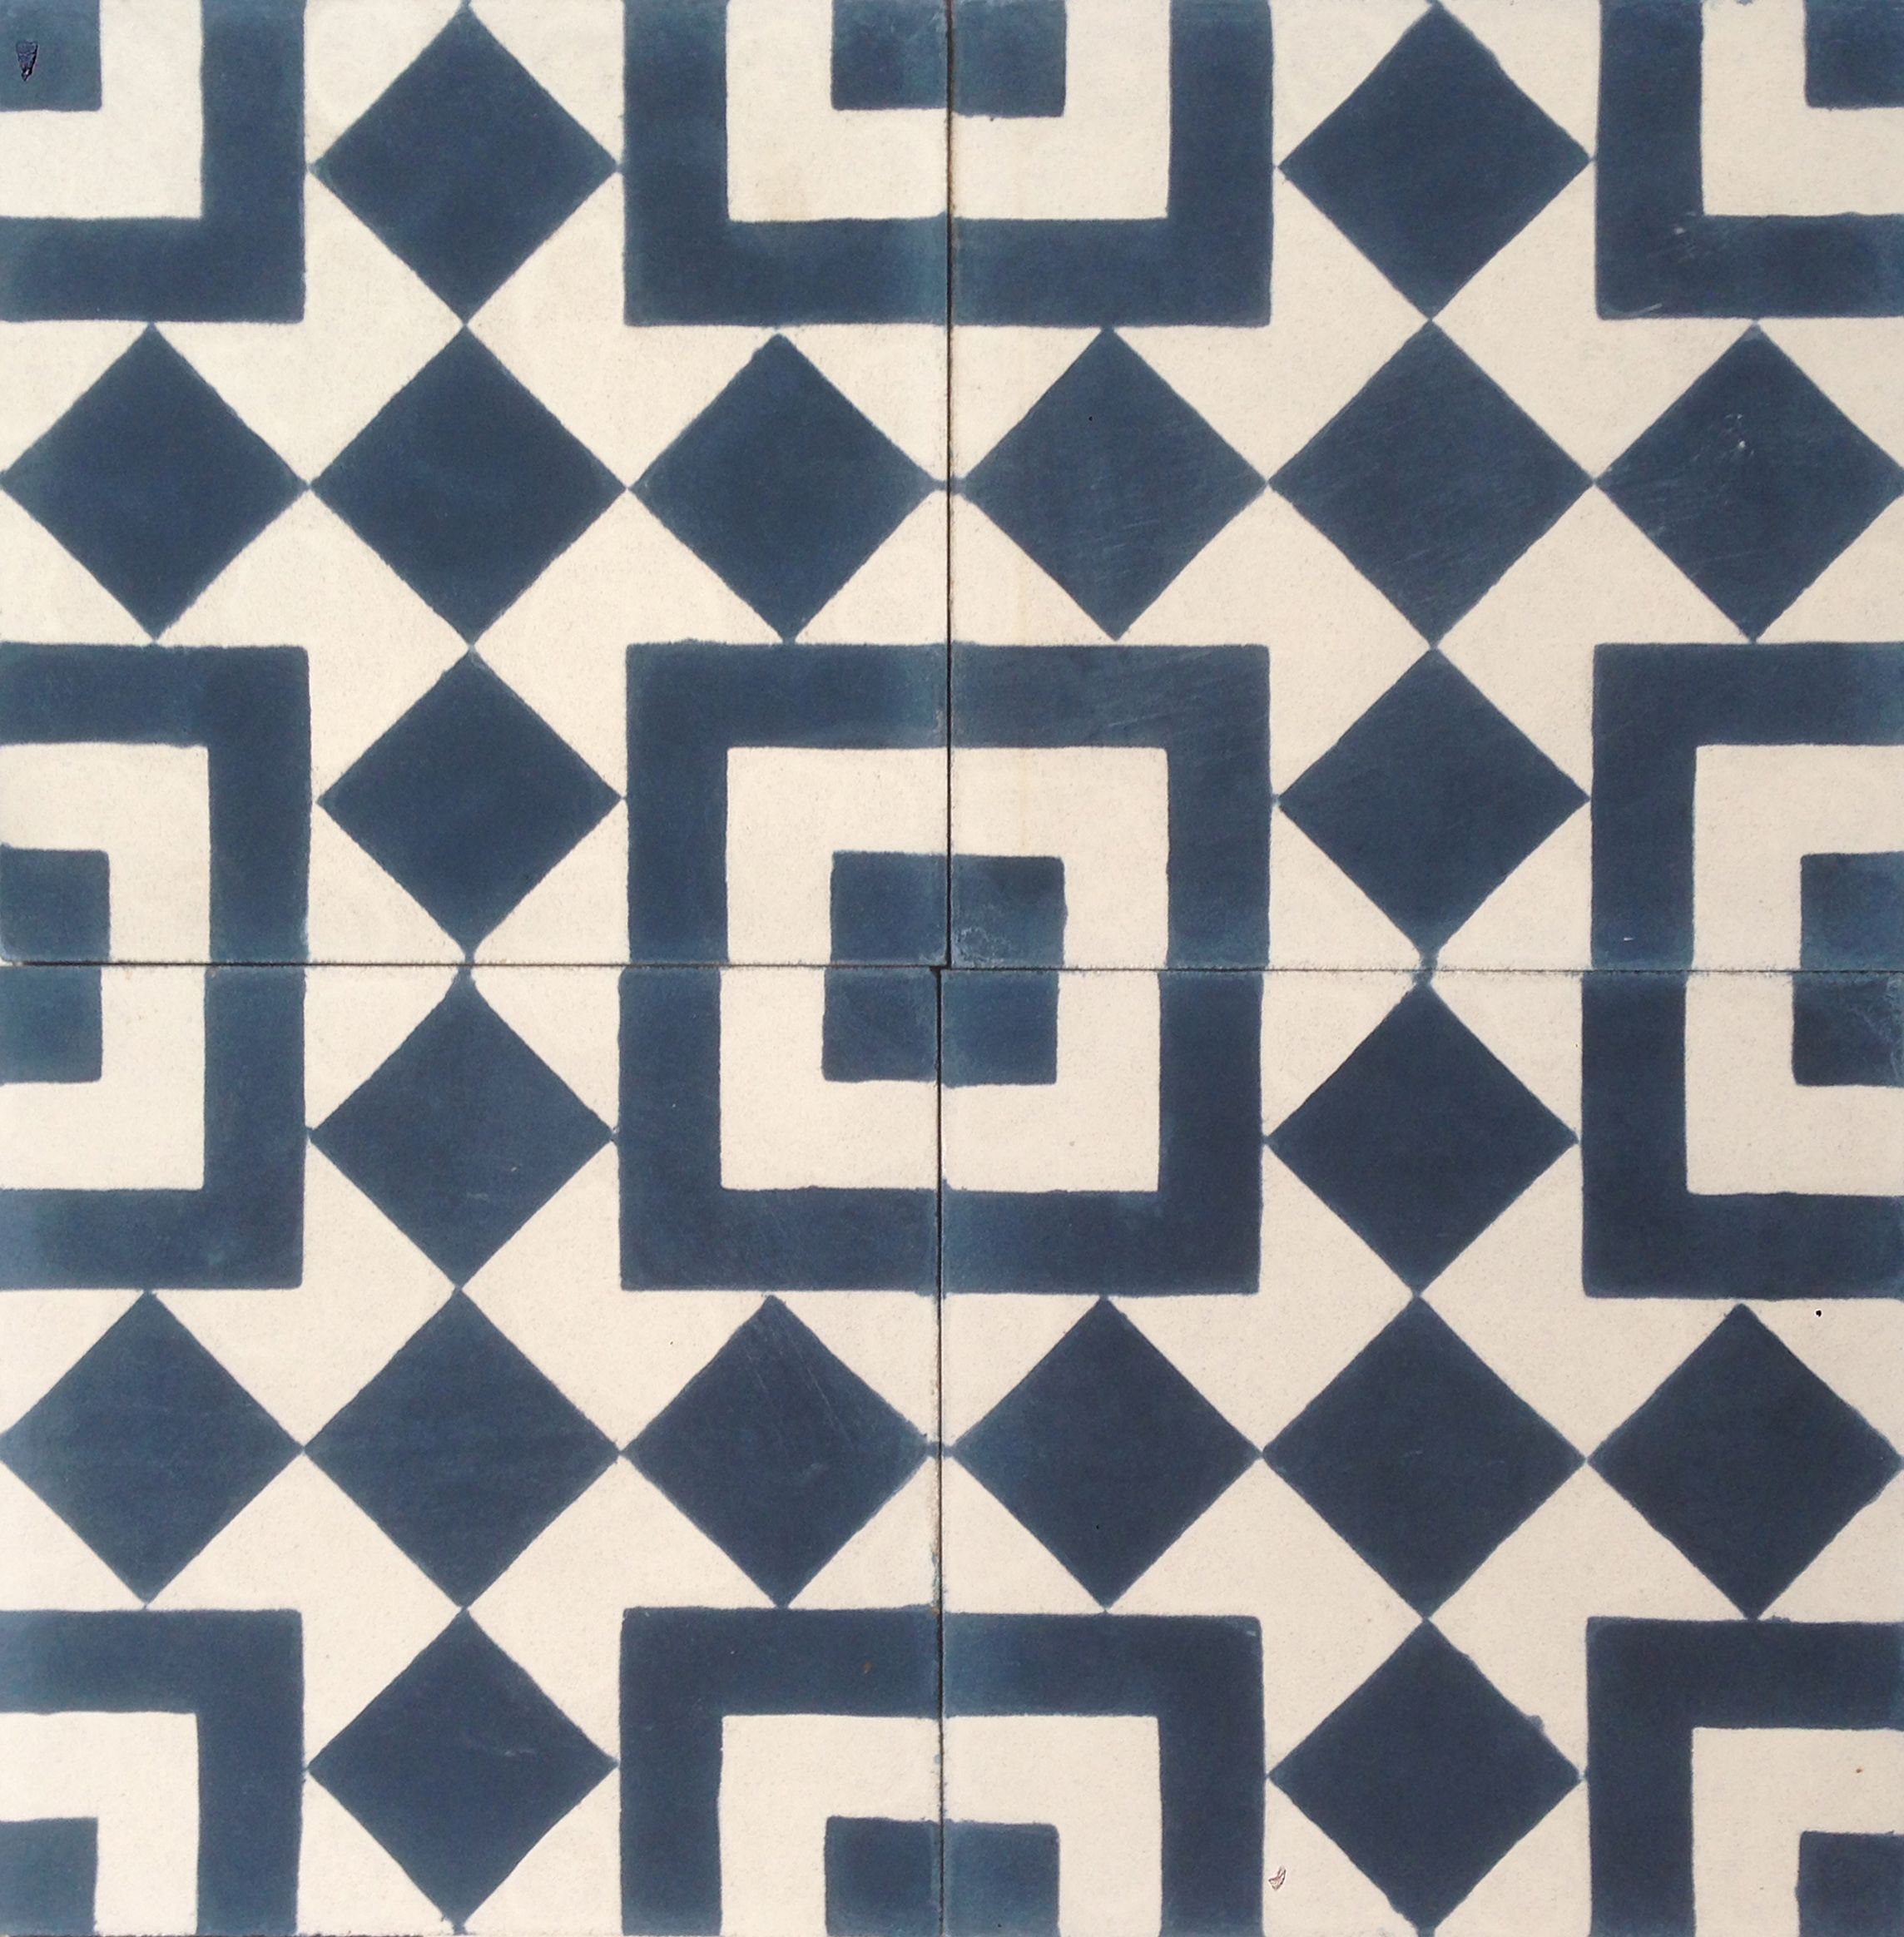 Balboa marine encaustic cement tile texturespatterns geometry balboa marine encaustic cement tile dailygadgetfo Images